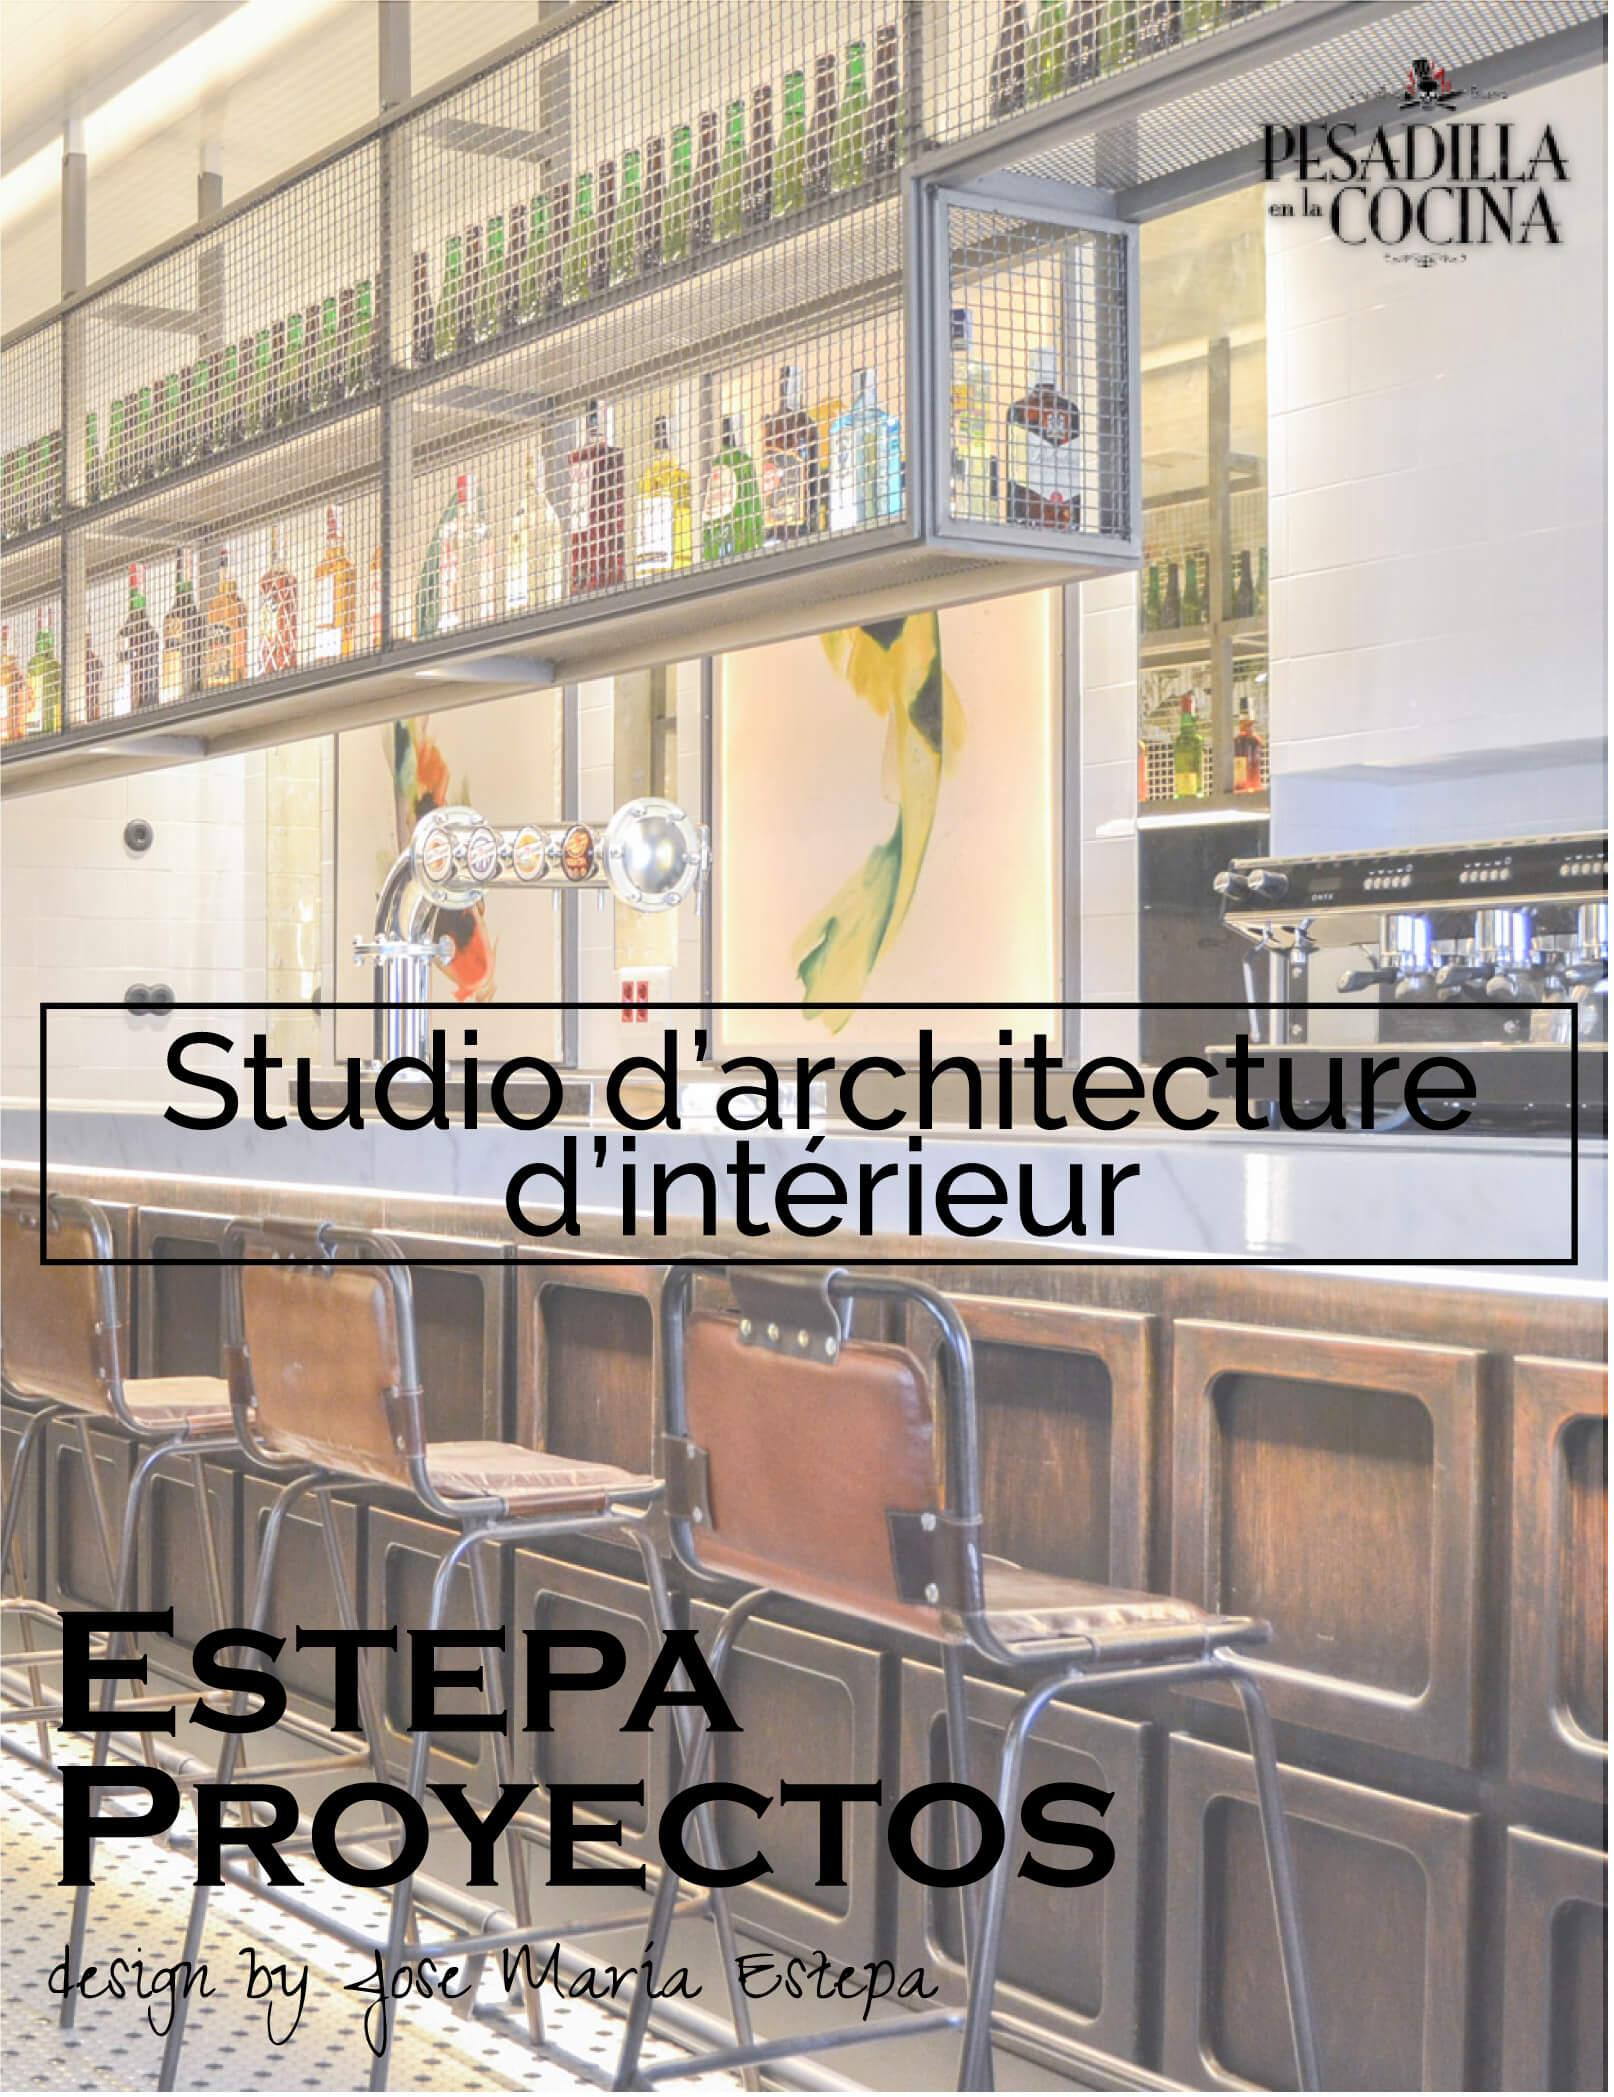 estepa proyectos